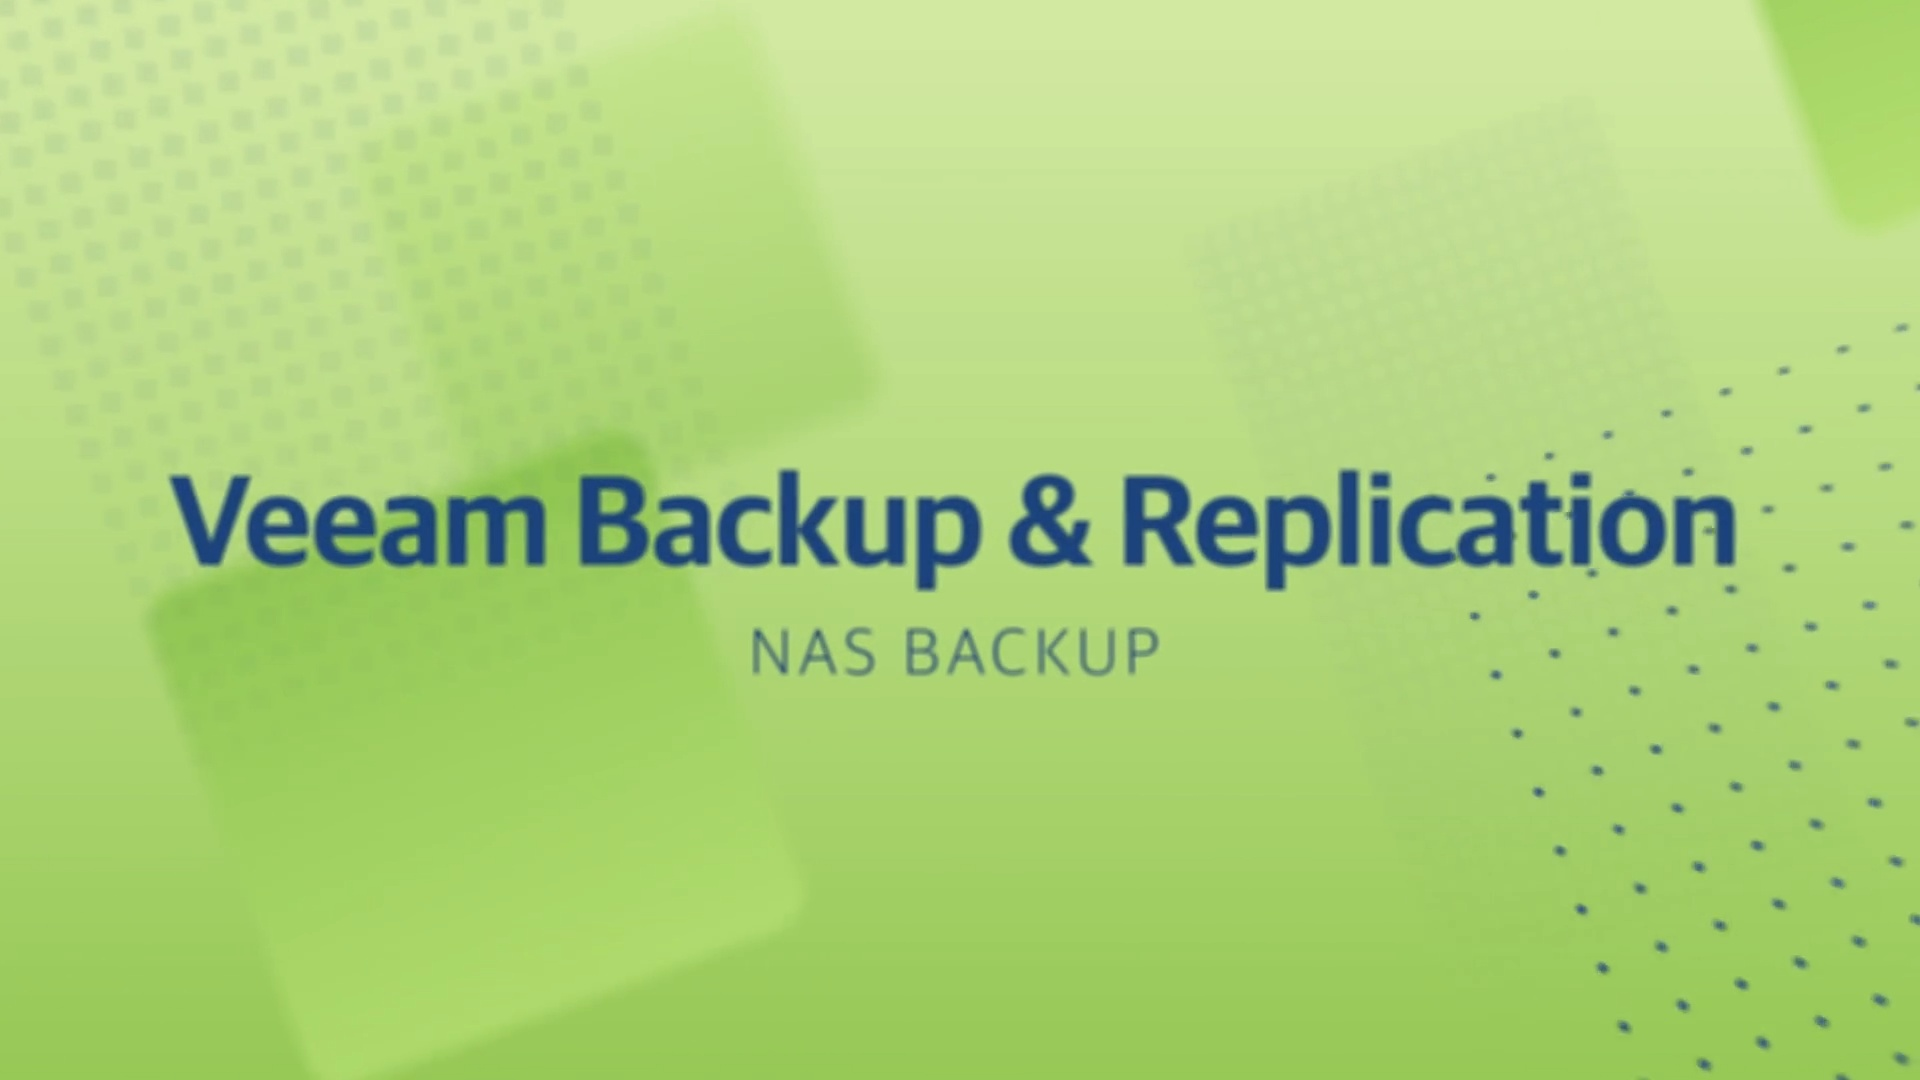 Product launch v11 - VBR - NAS Backup